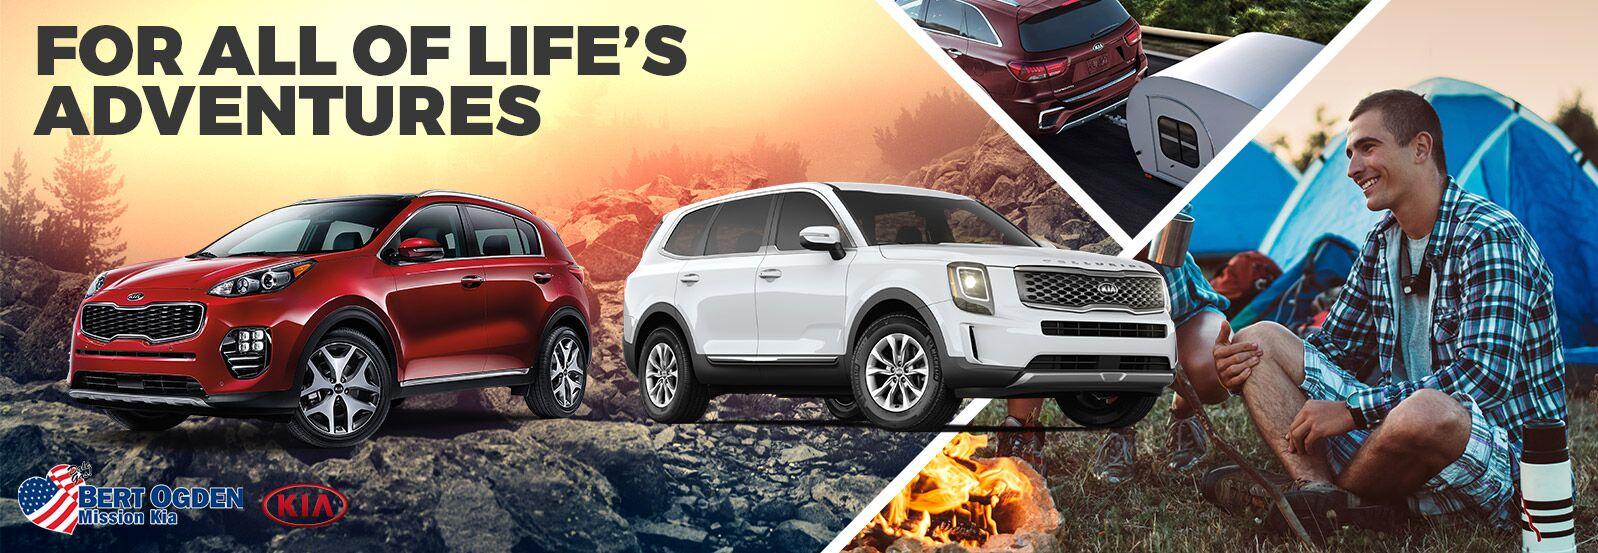 Mazda Vehicles For Weekend Adventurers - Bert Ogden Mission Mazda - Mission, TX